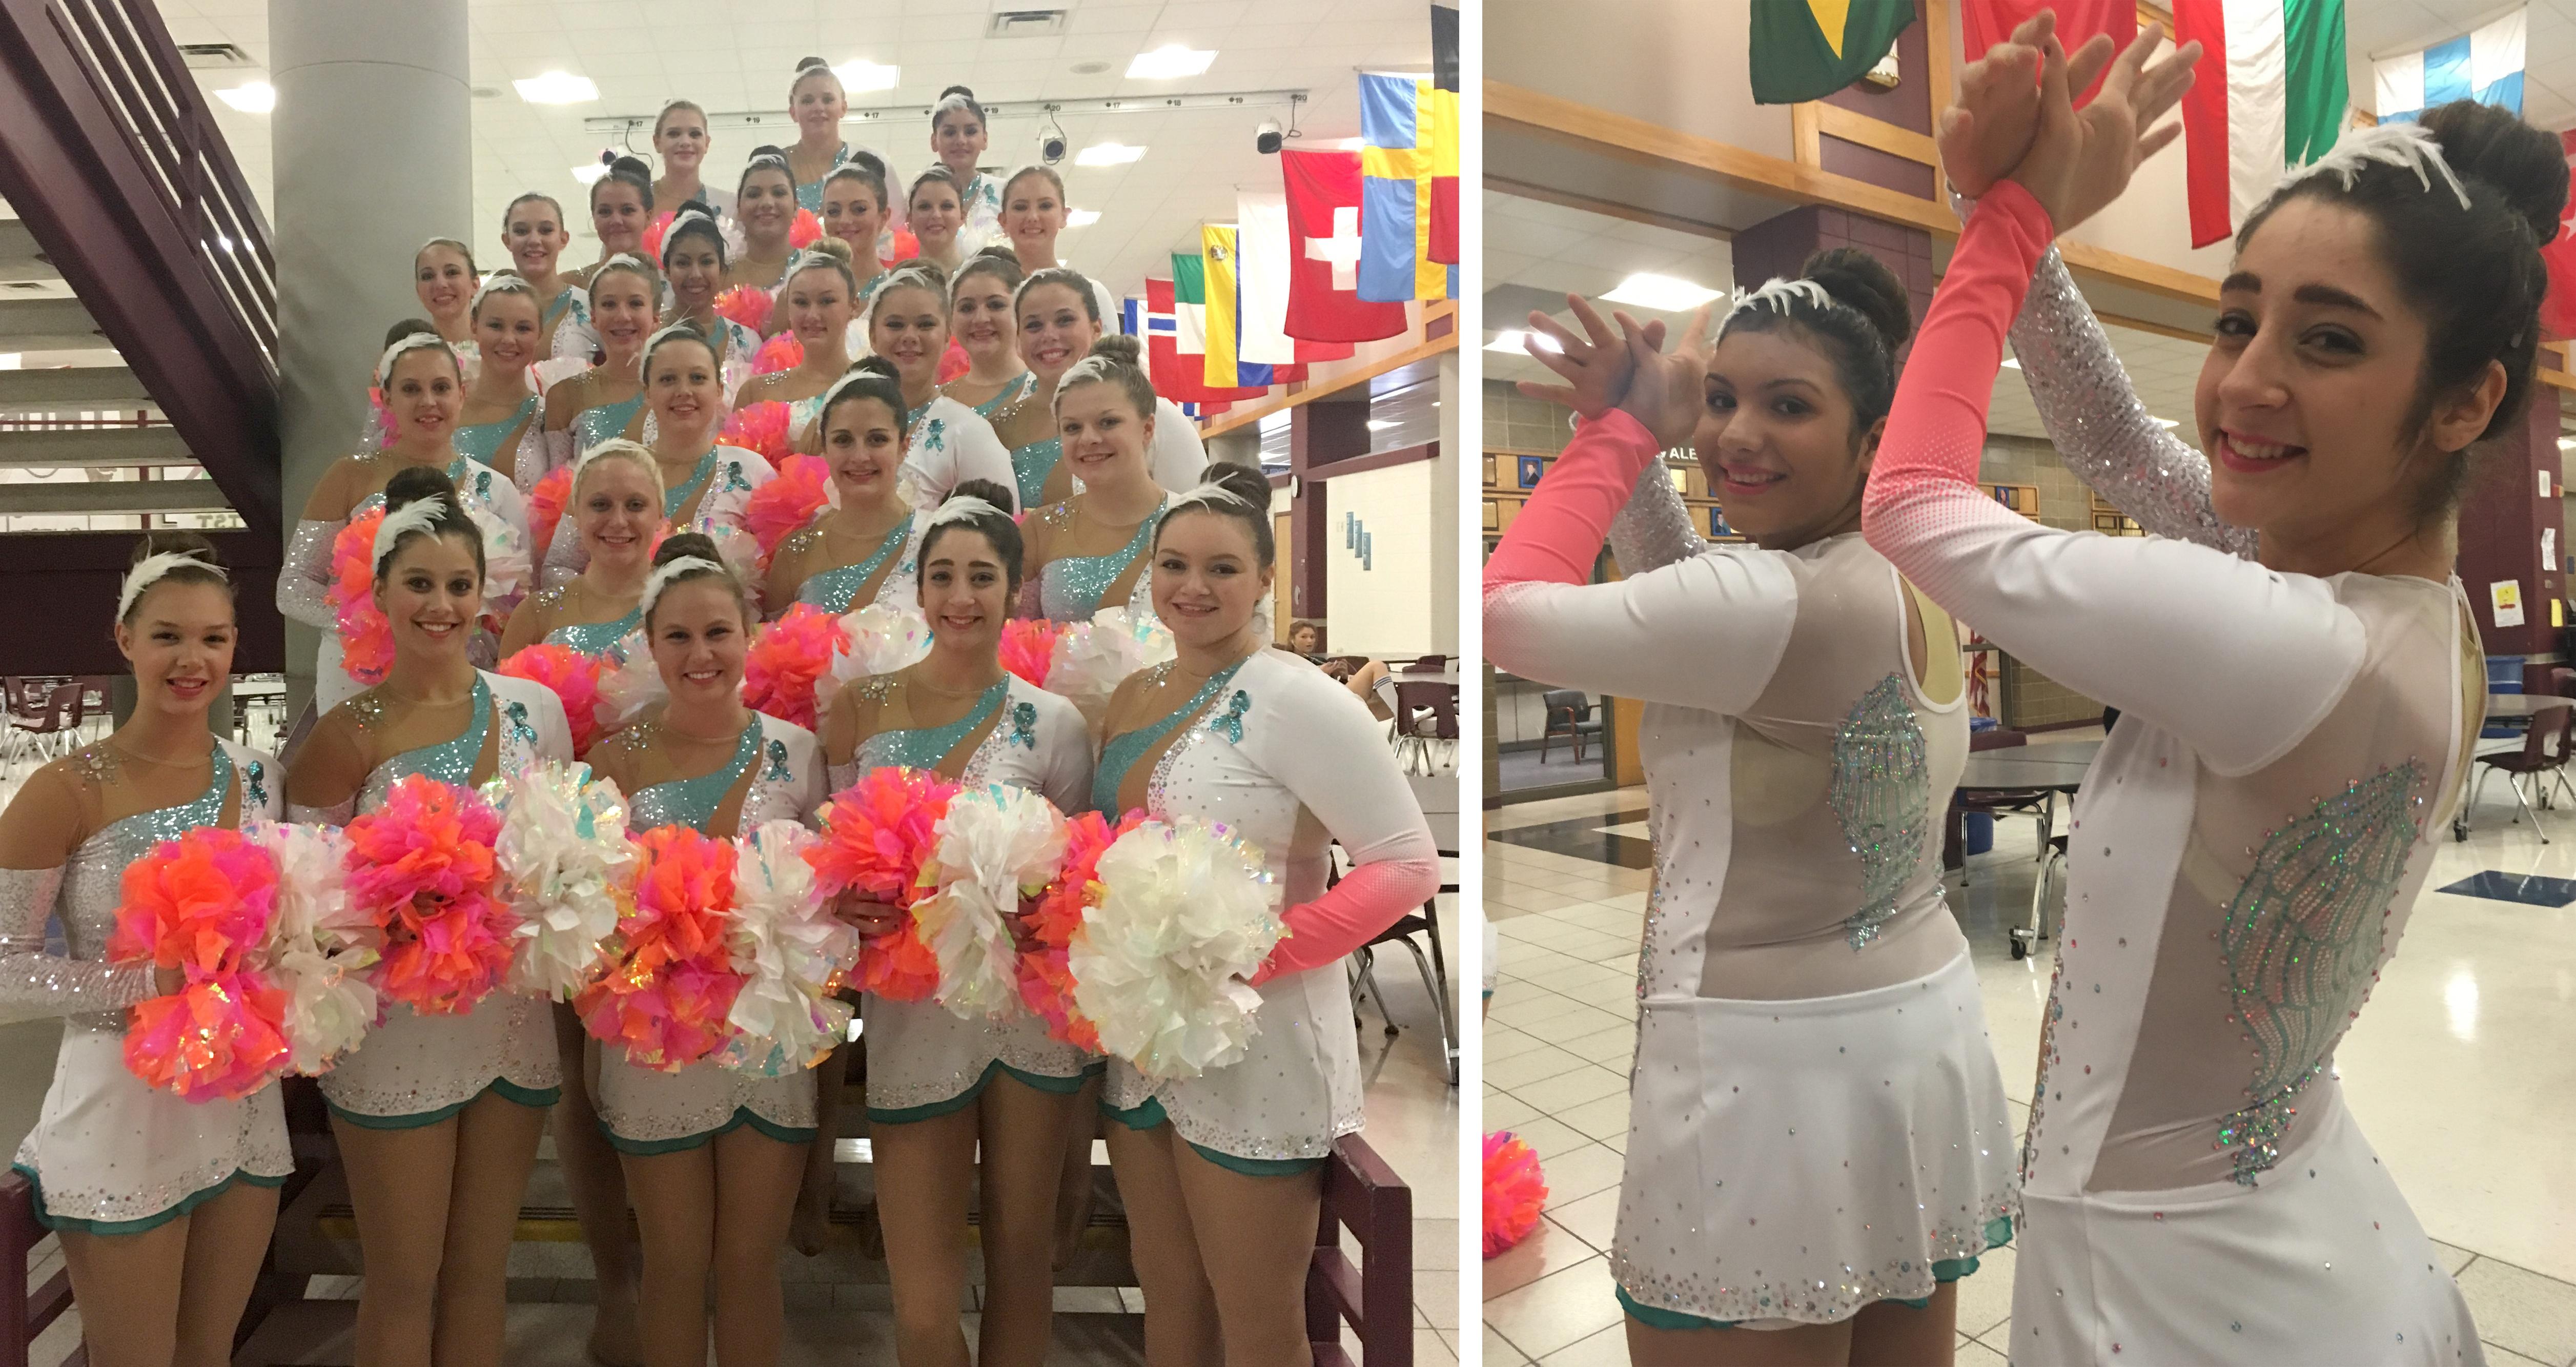 Watertown blue Revue dance team custom pom uniforms